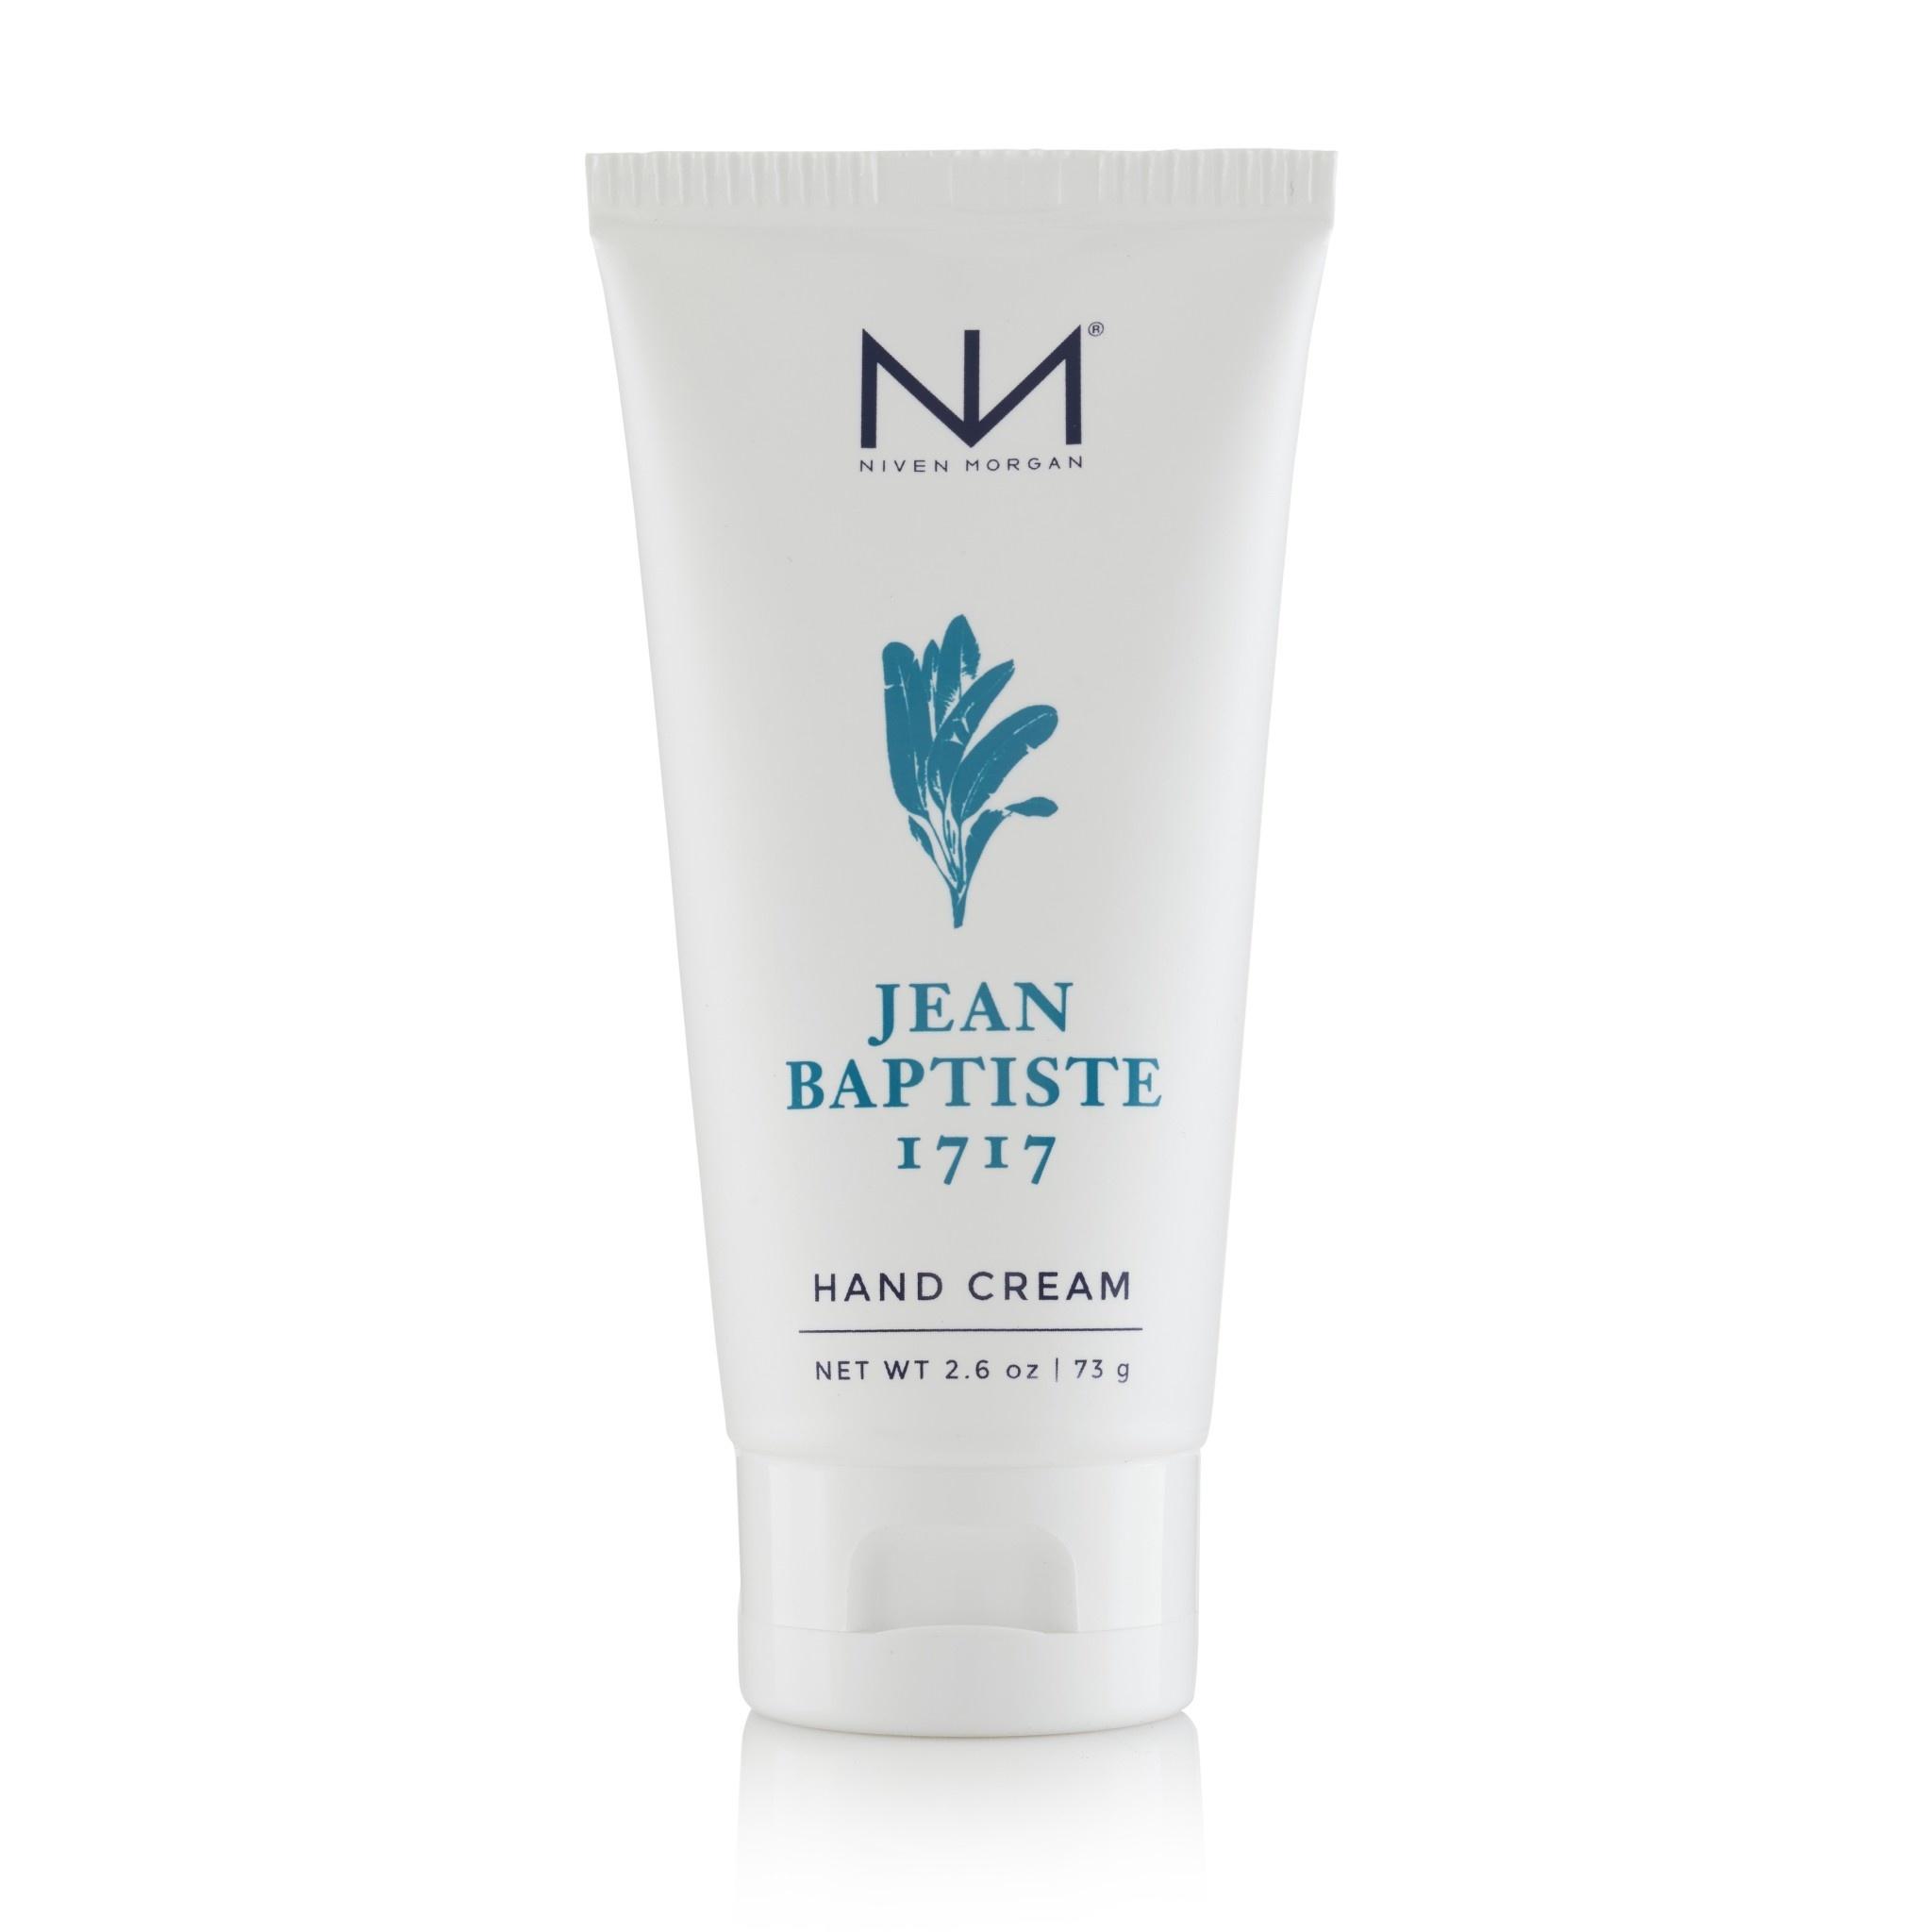 Niven Morgan Jean Baptiste Travel Hand Cream 2.6oz